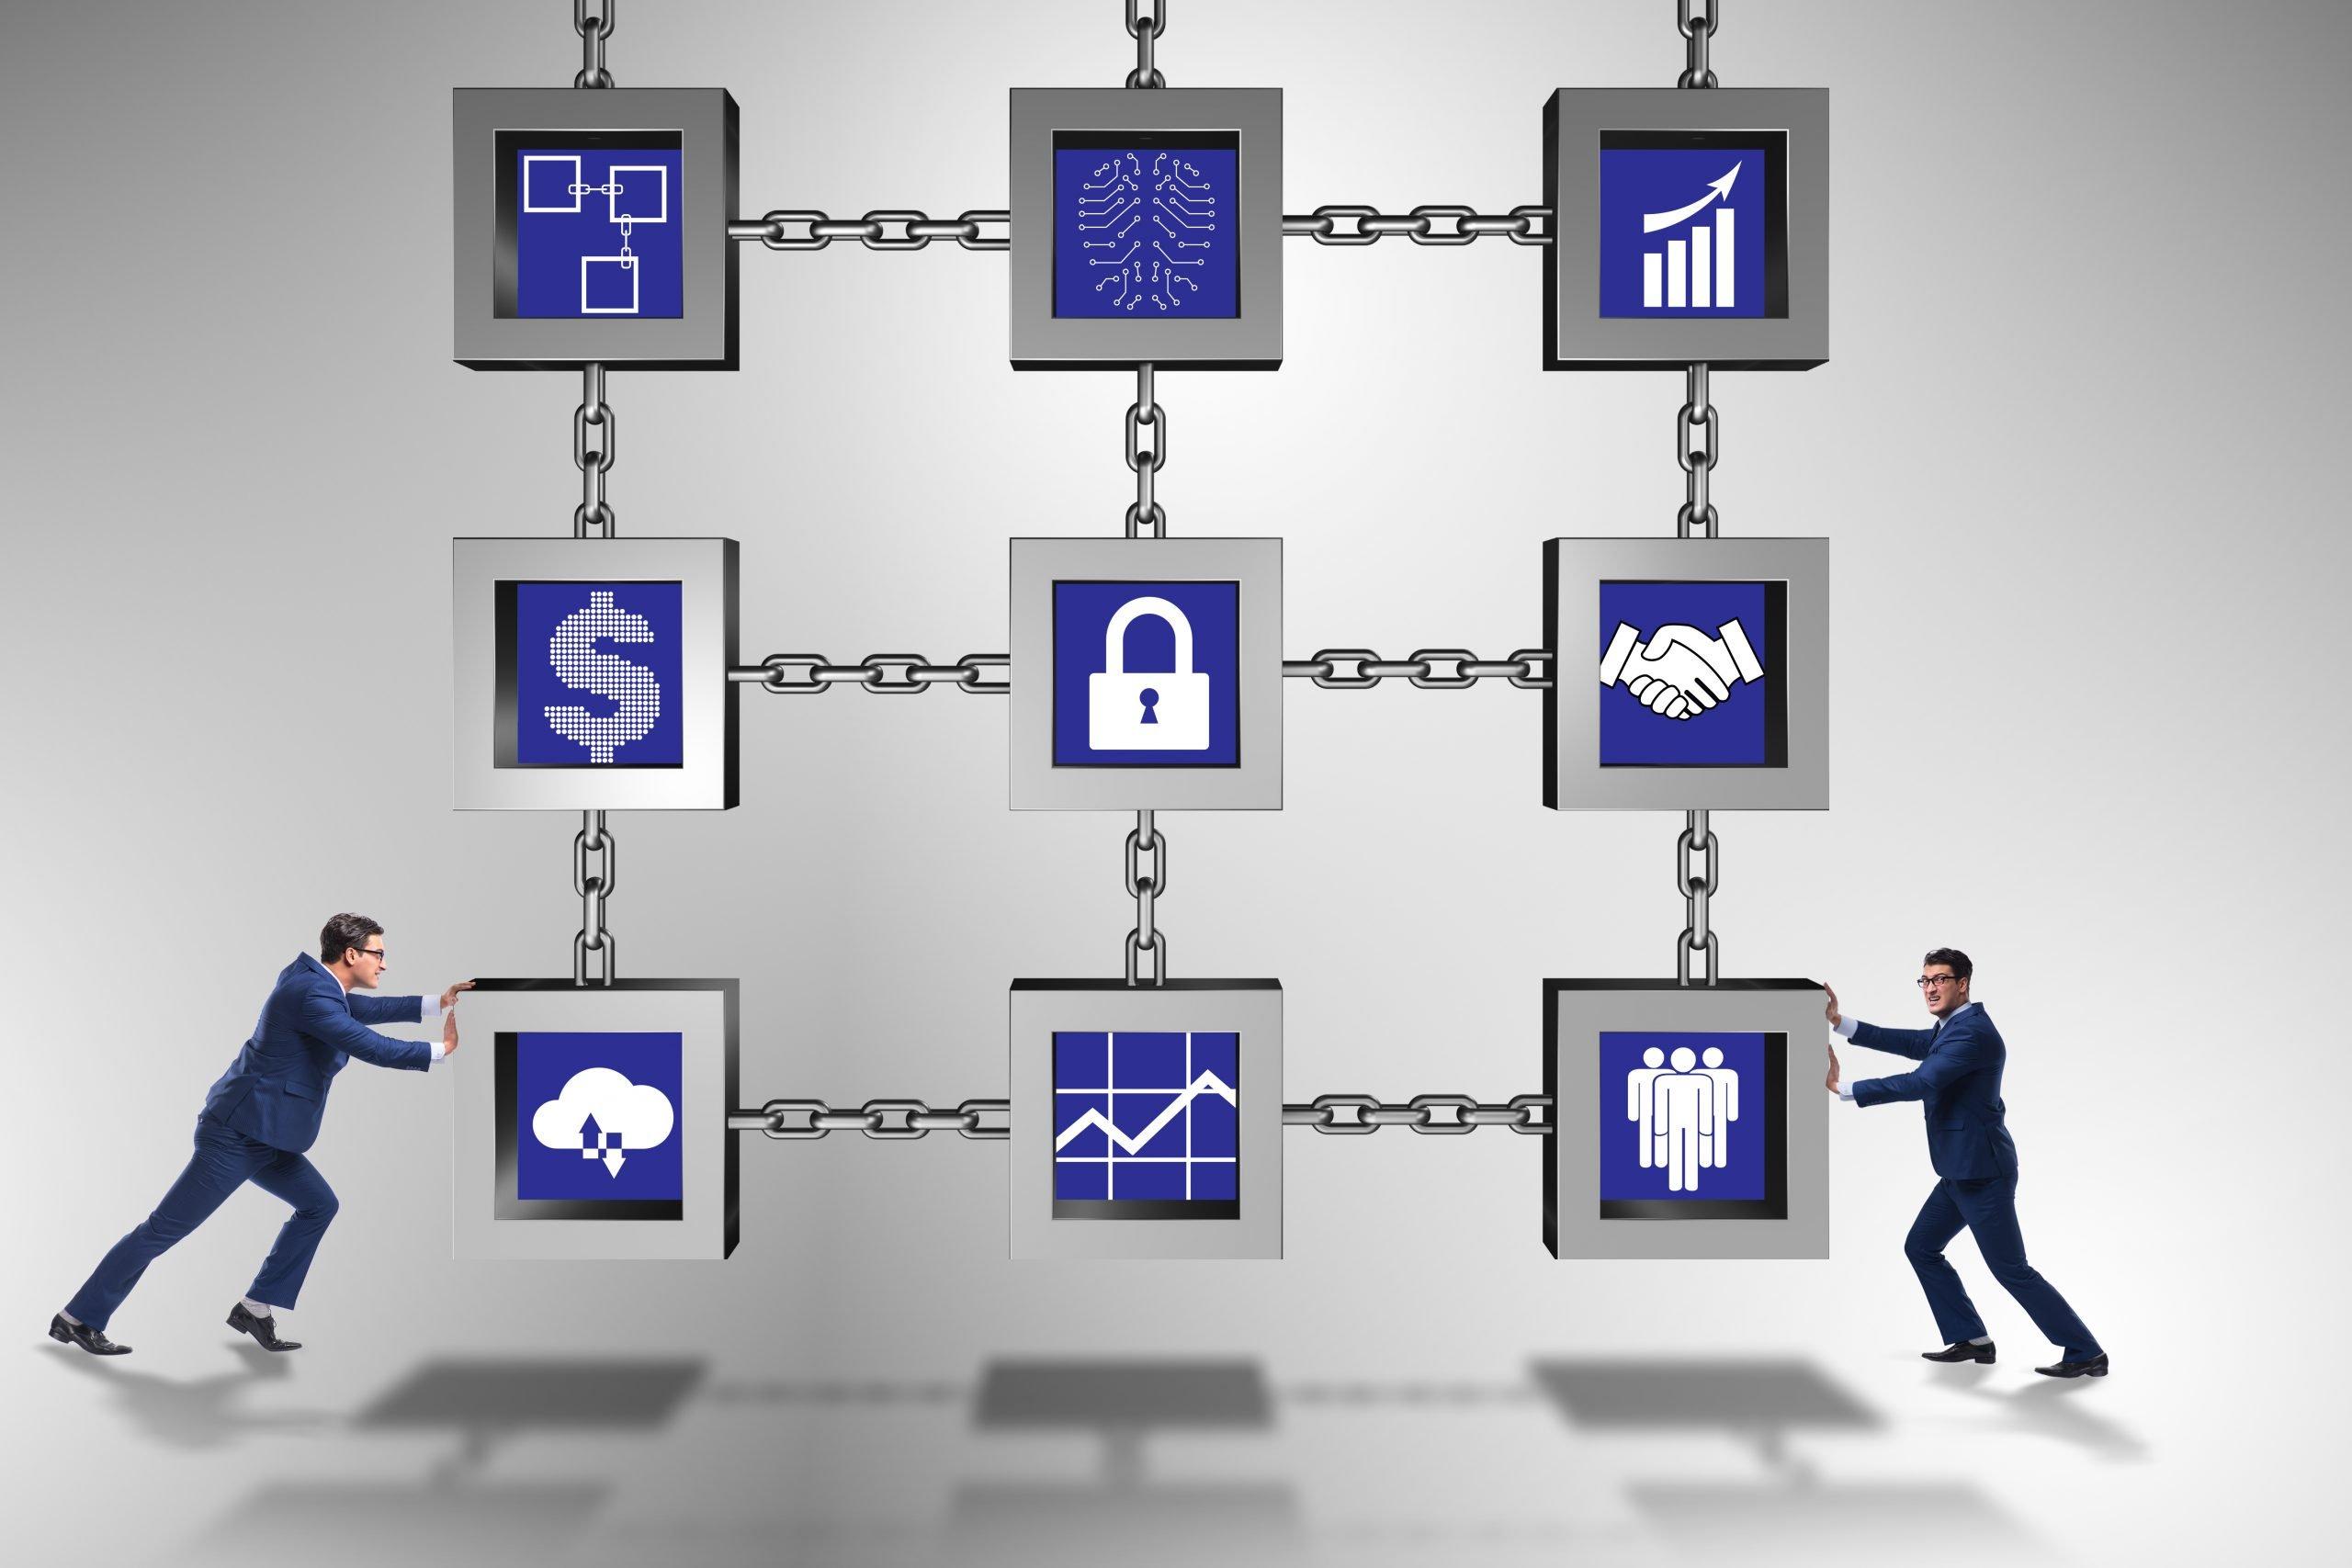 rmda-ss-finance-blockchain-consultants.5669.3780